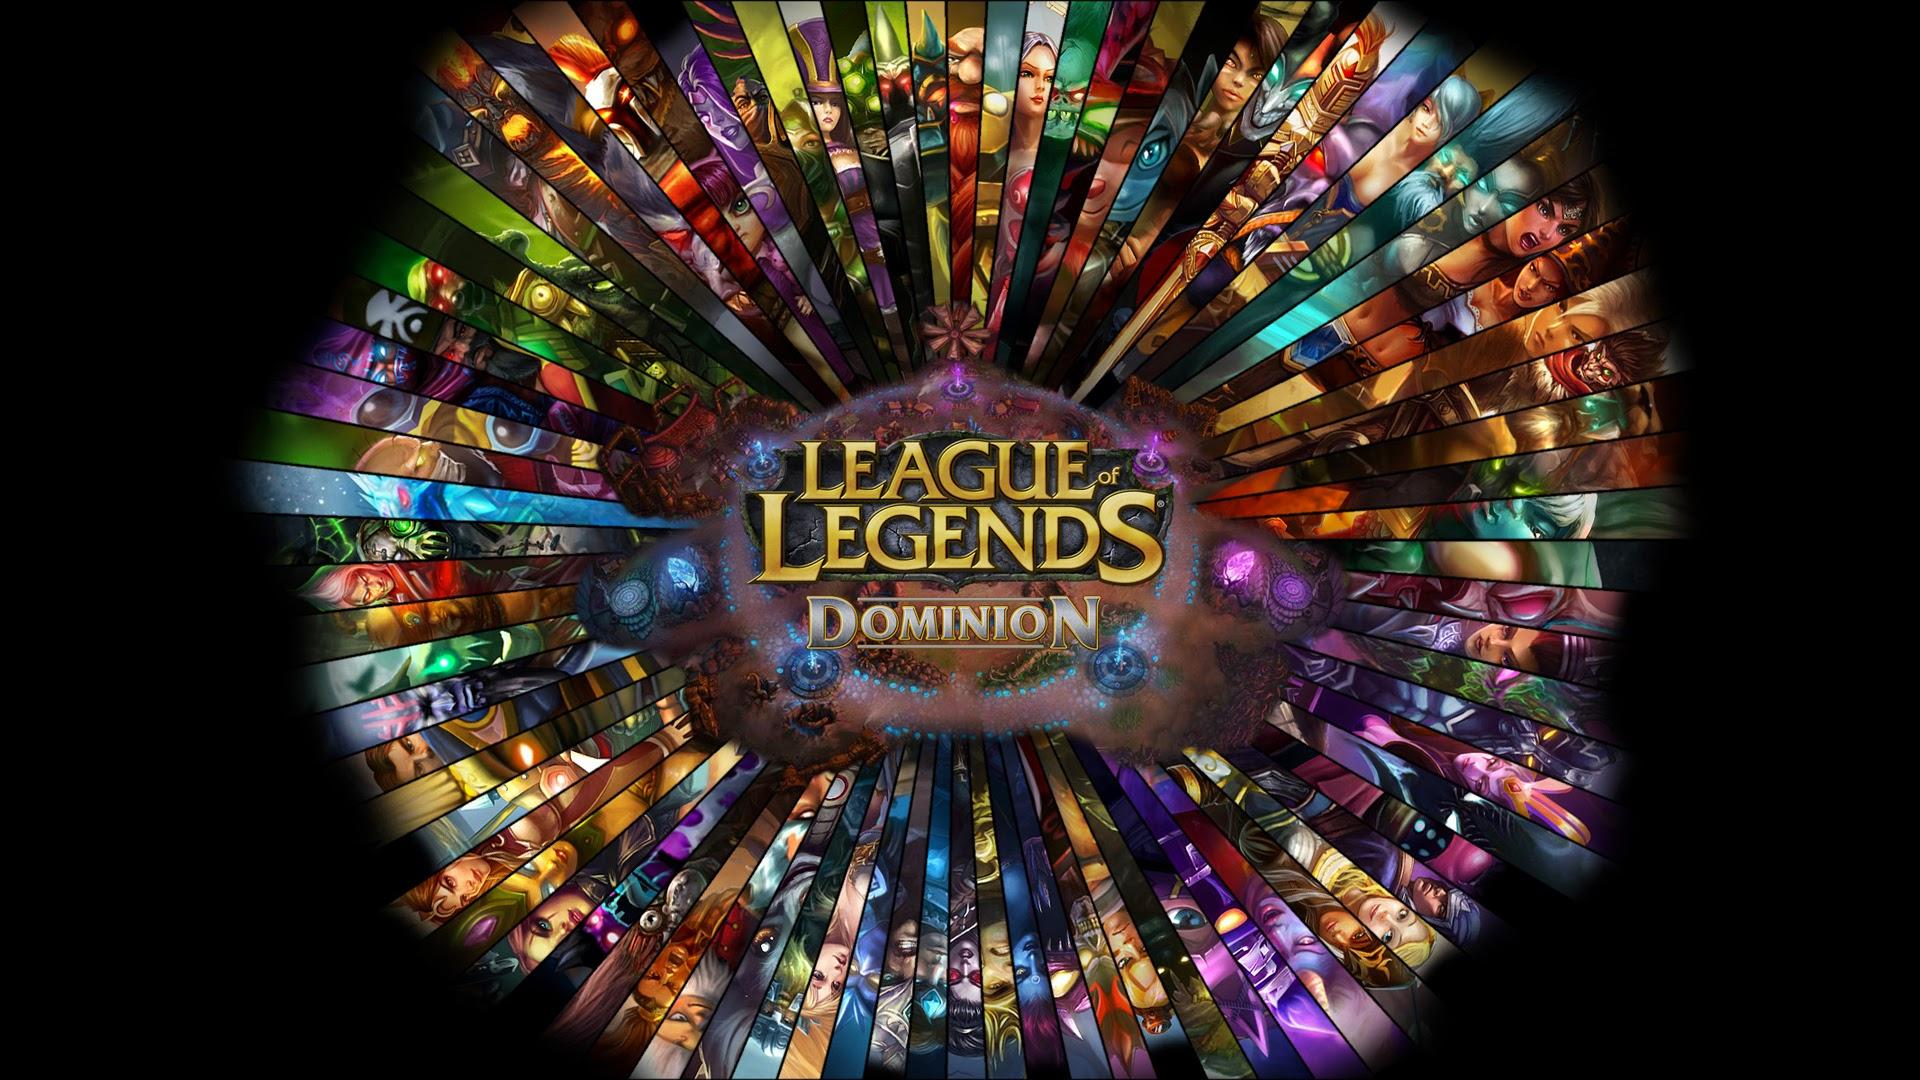 Pics photos pictures league of legends heroes wallpaper hd 1080p jpg - League Of Legends Dominion Hd Wallpaper Lol Champion 1920x1080 3w